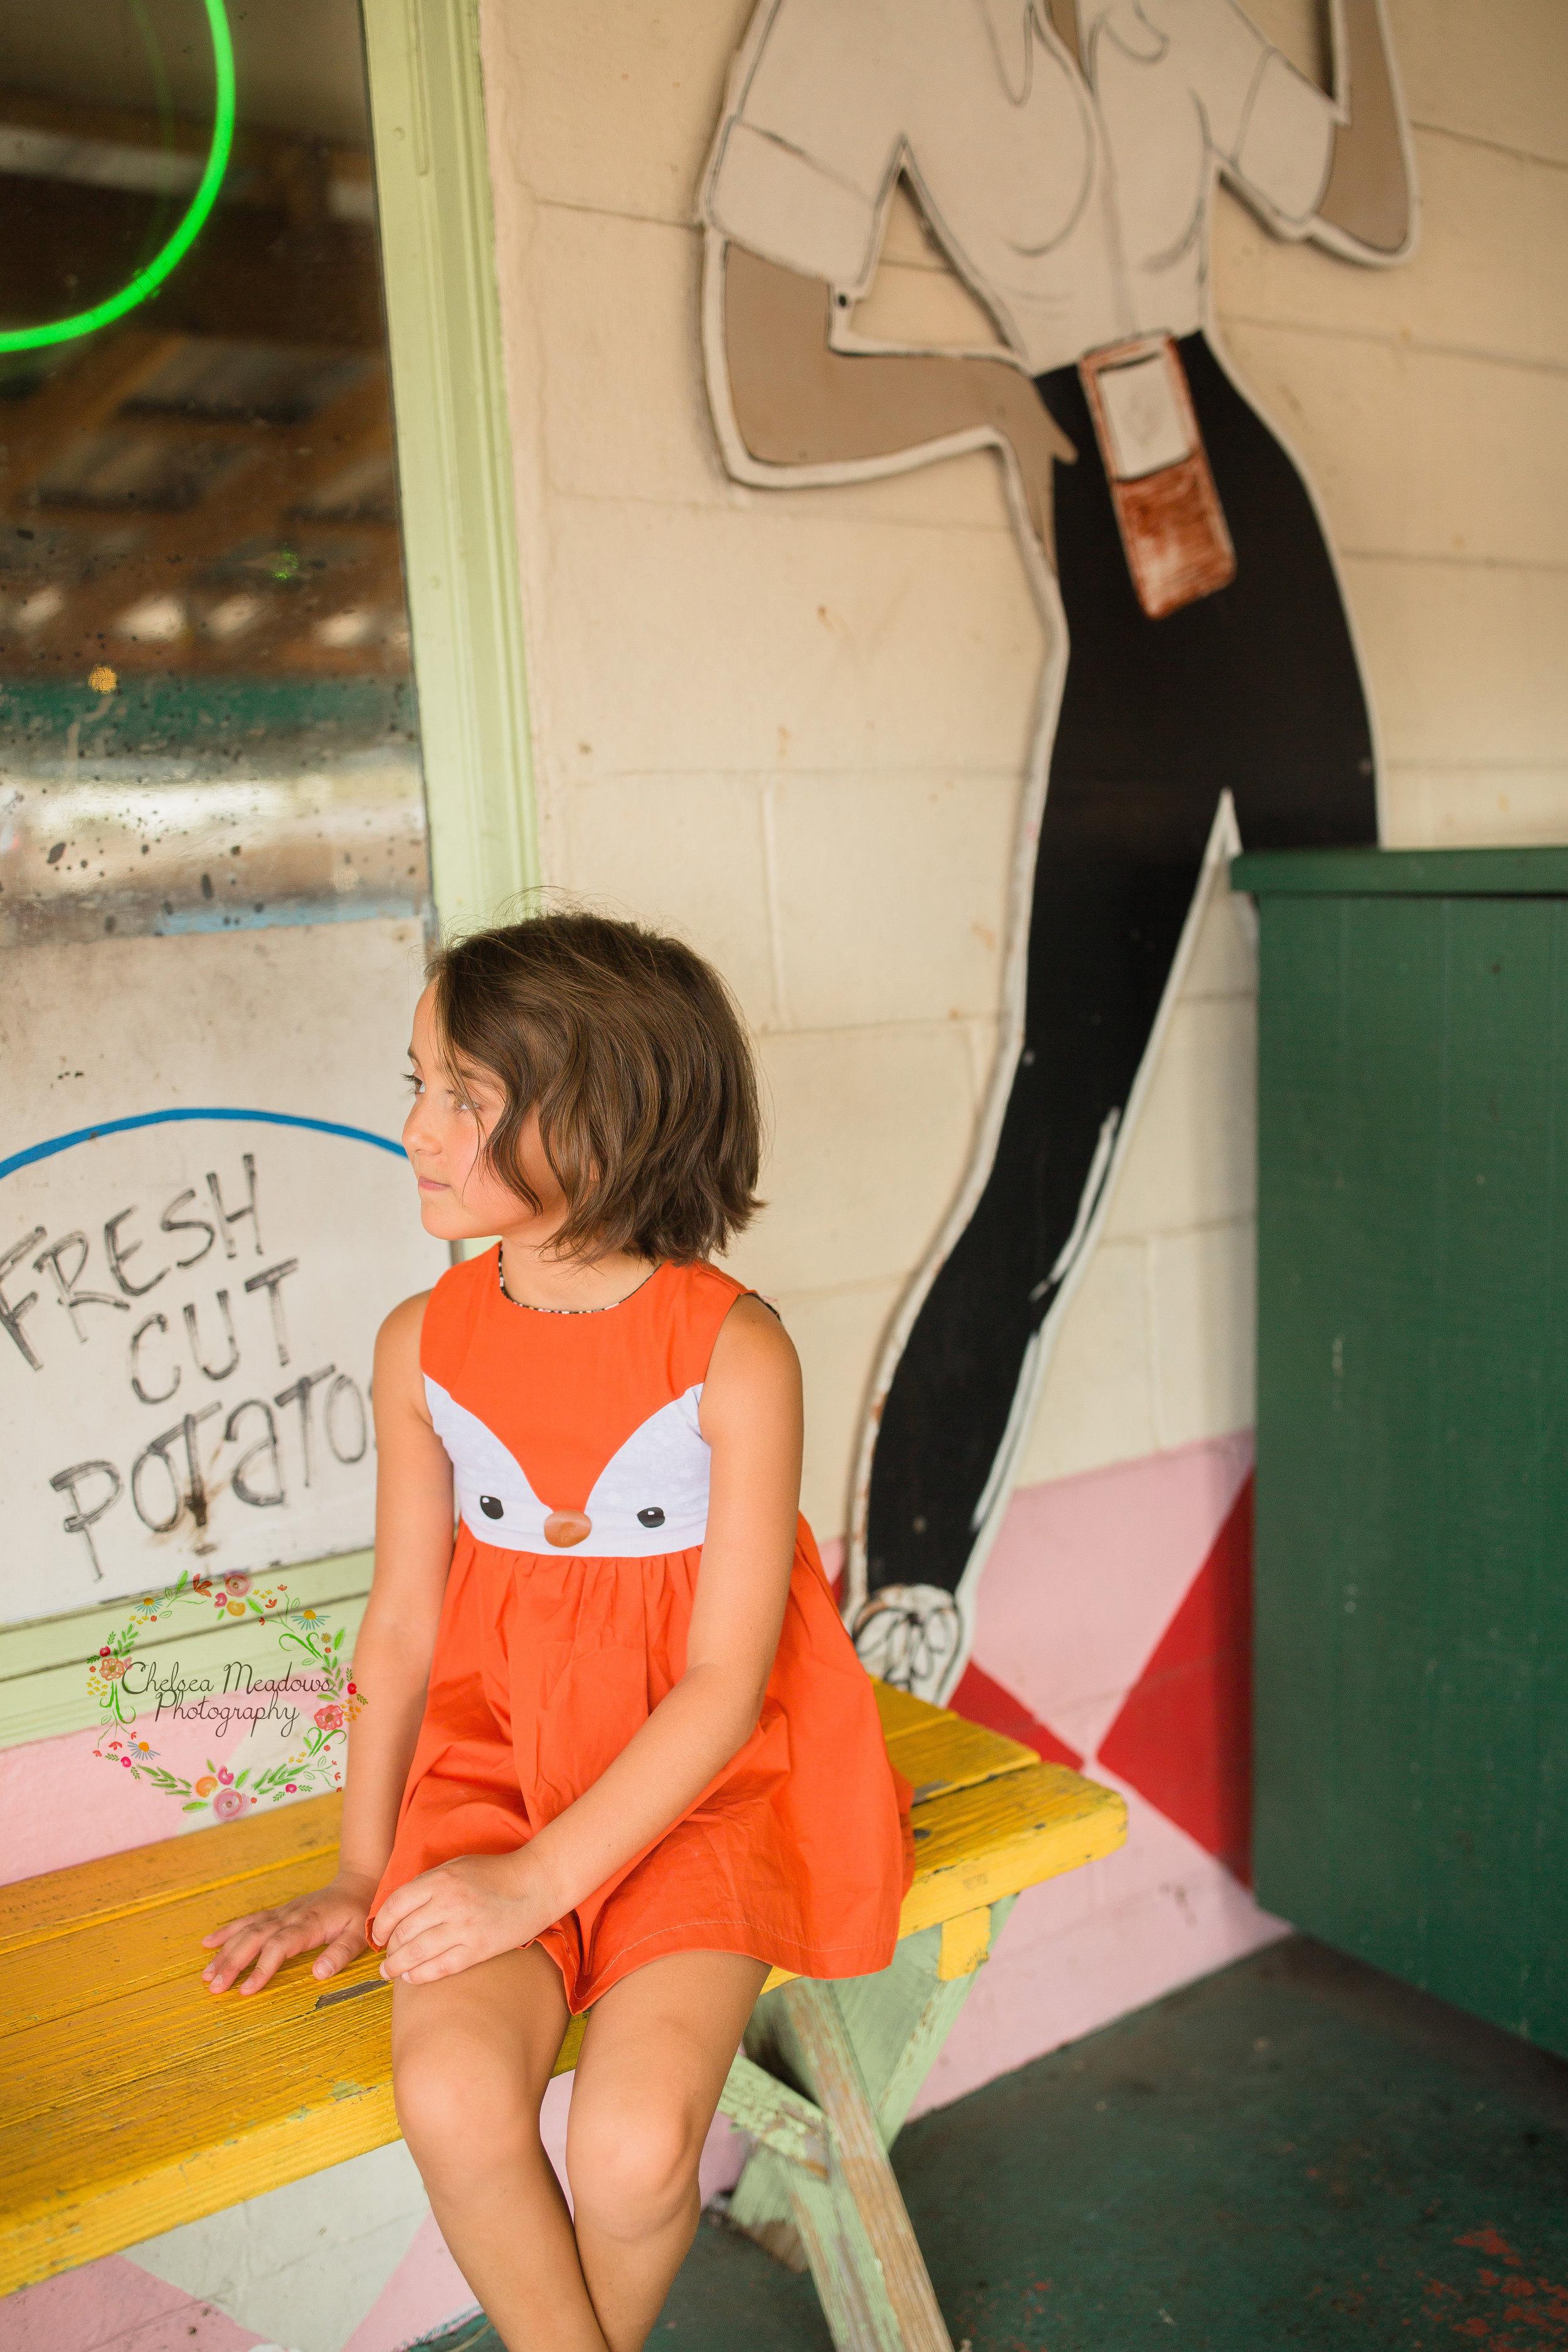 Izzy Family Photoshoot - Nashville Family Photographer - Chelsea Meadows Photography (30).jpg